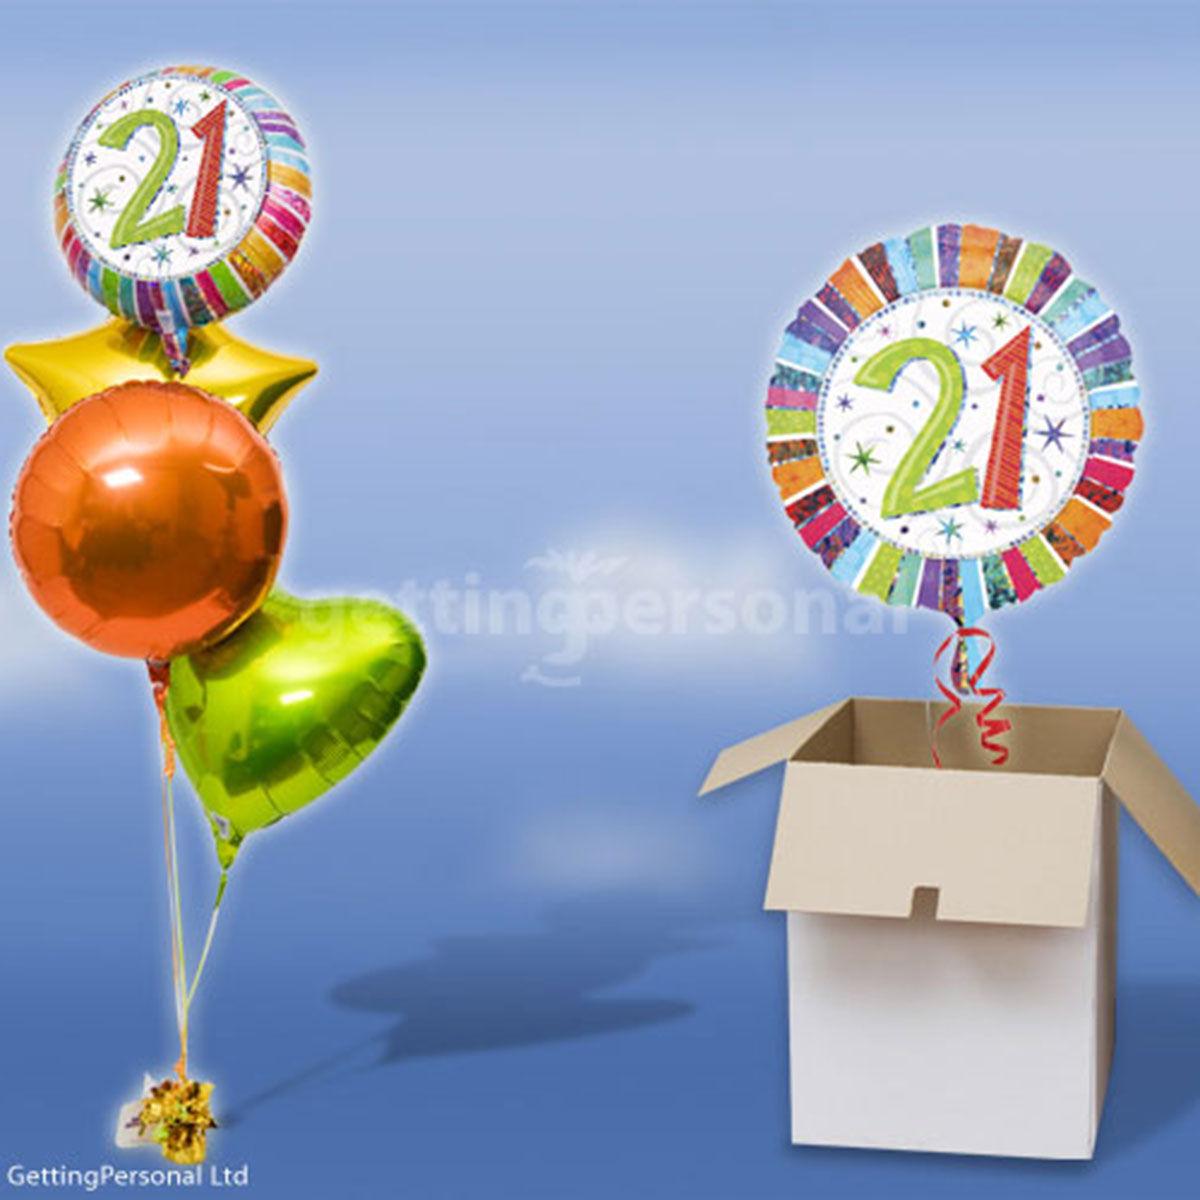 21st birthday balloon in a box